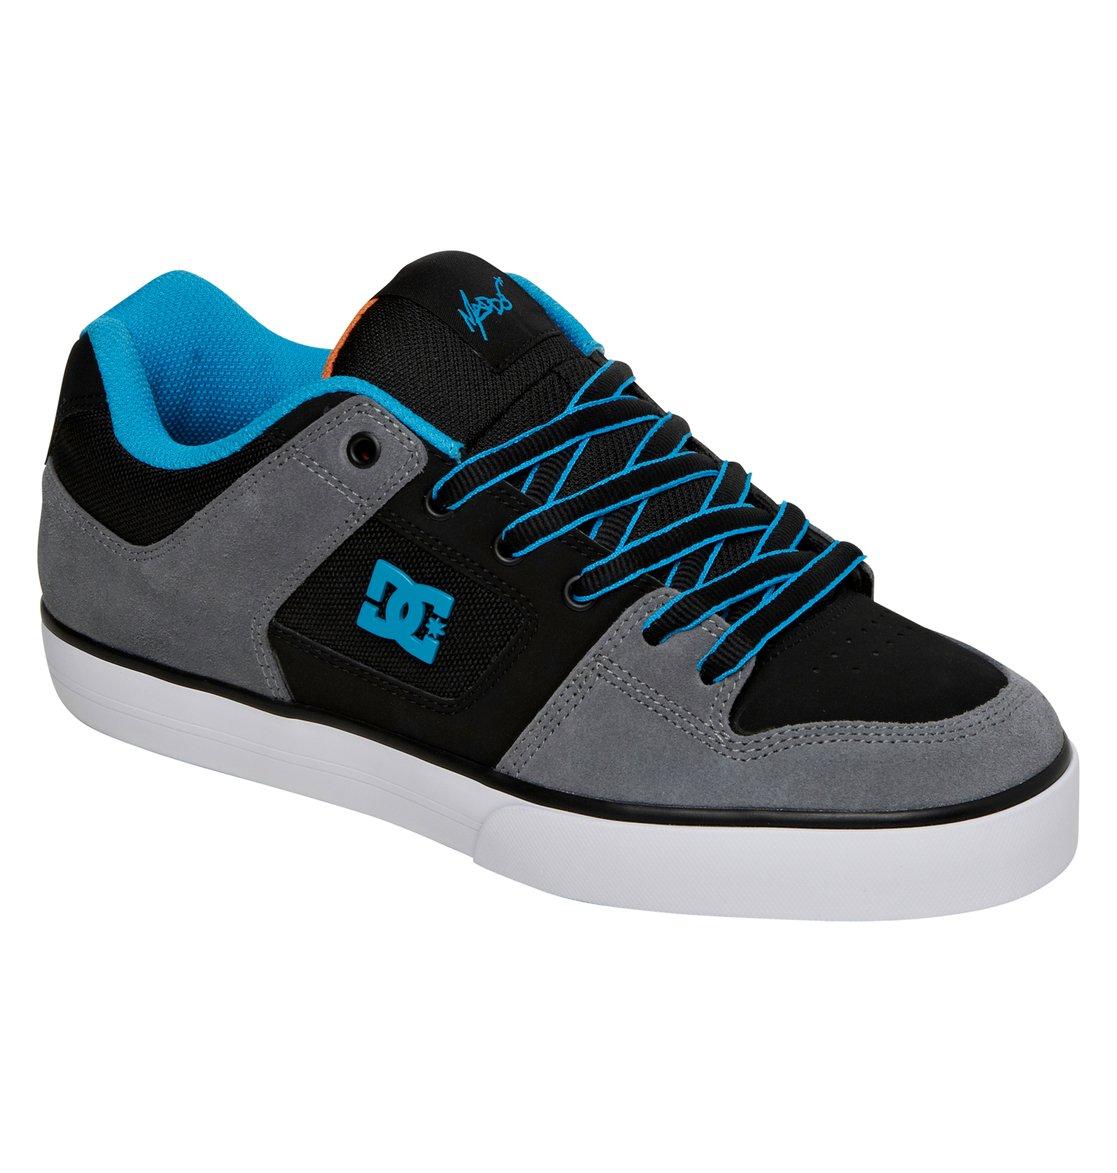 pure rm shoes adys400026 dc shoes. Black Bedroom Furniture Sets. Home Design Ideas